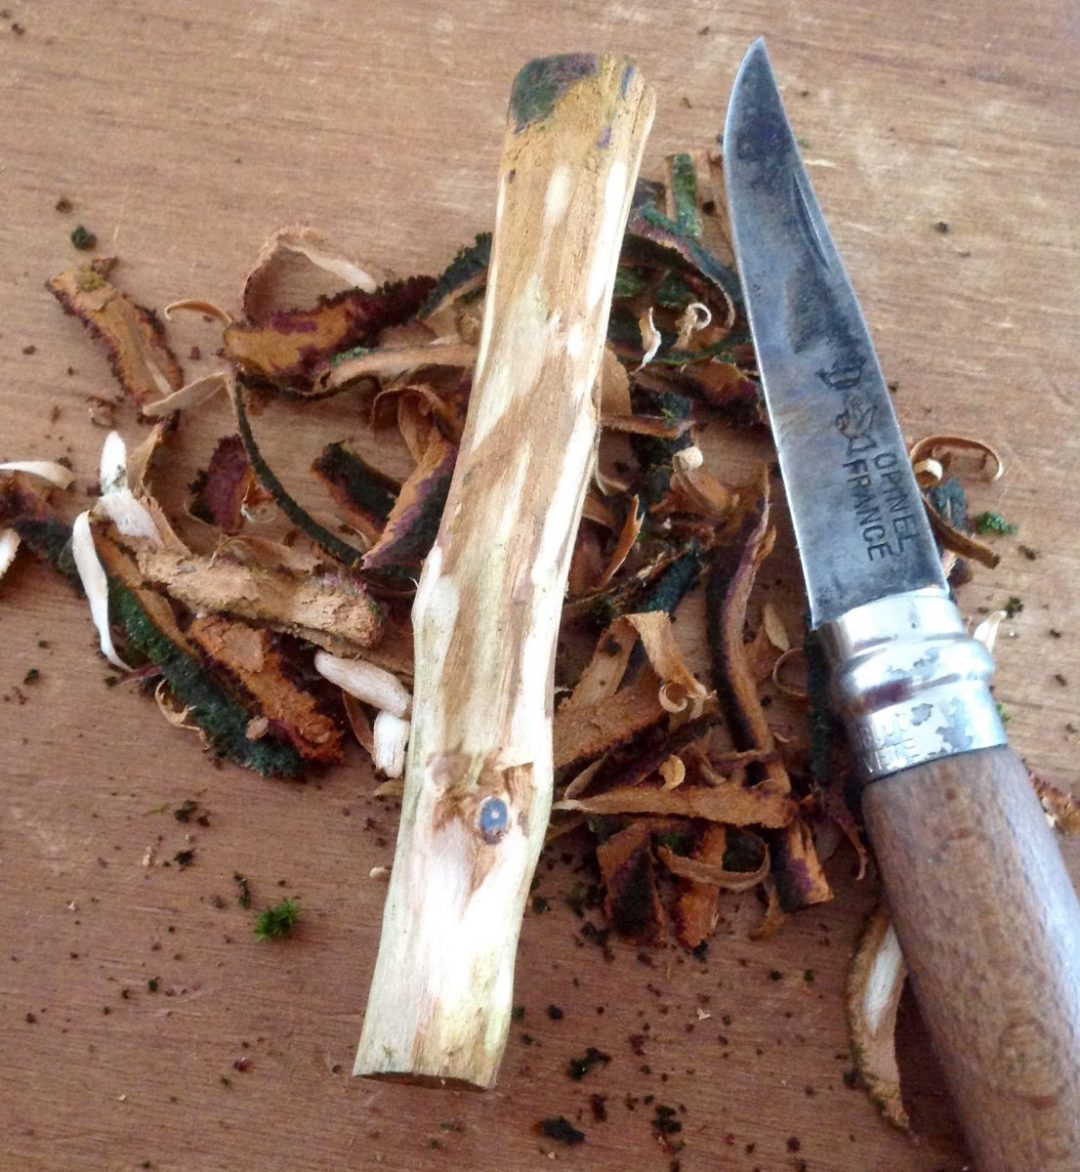 Jason-Robards-Hedgerow-Crafts-Handmade-Greenwood-blackthorn-pipe-tamper